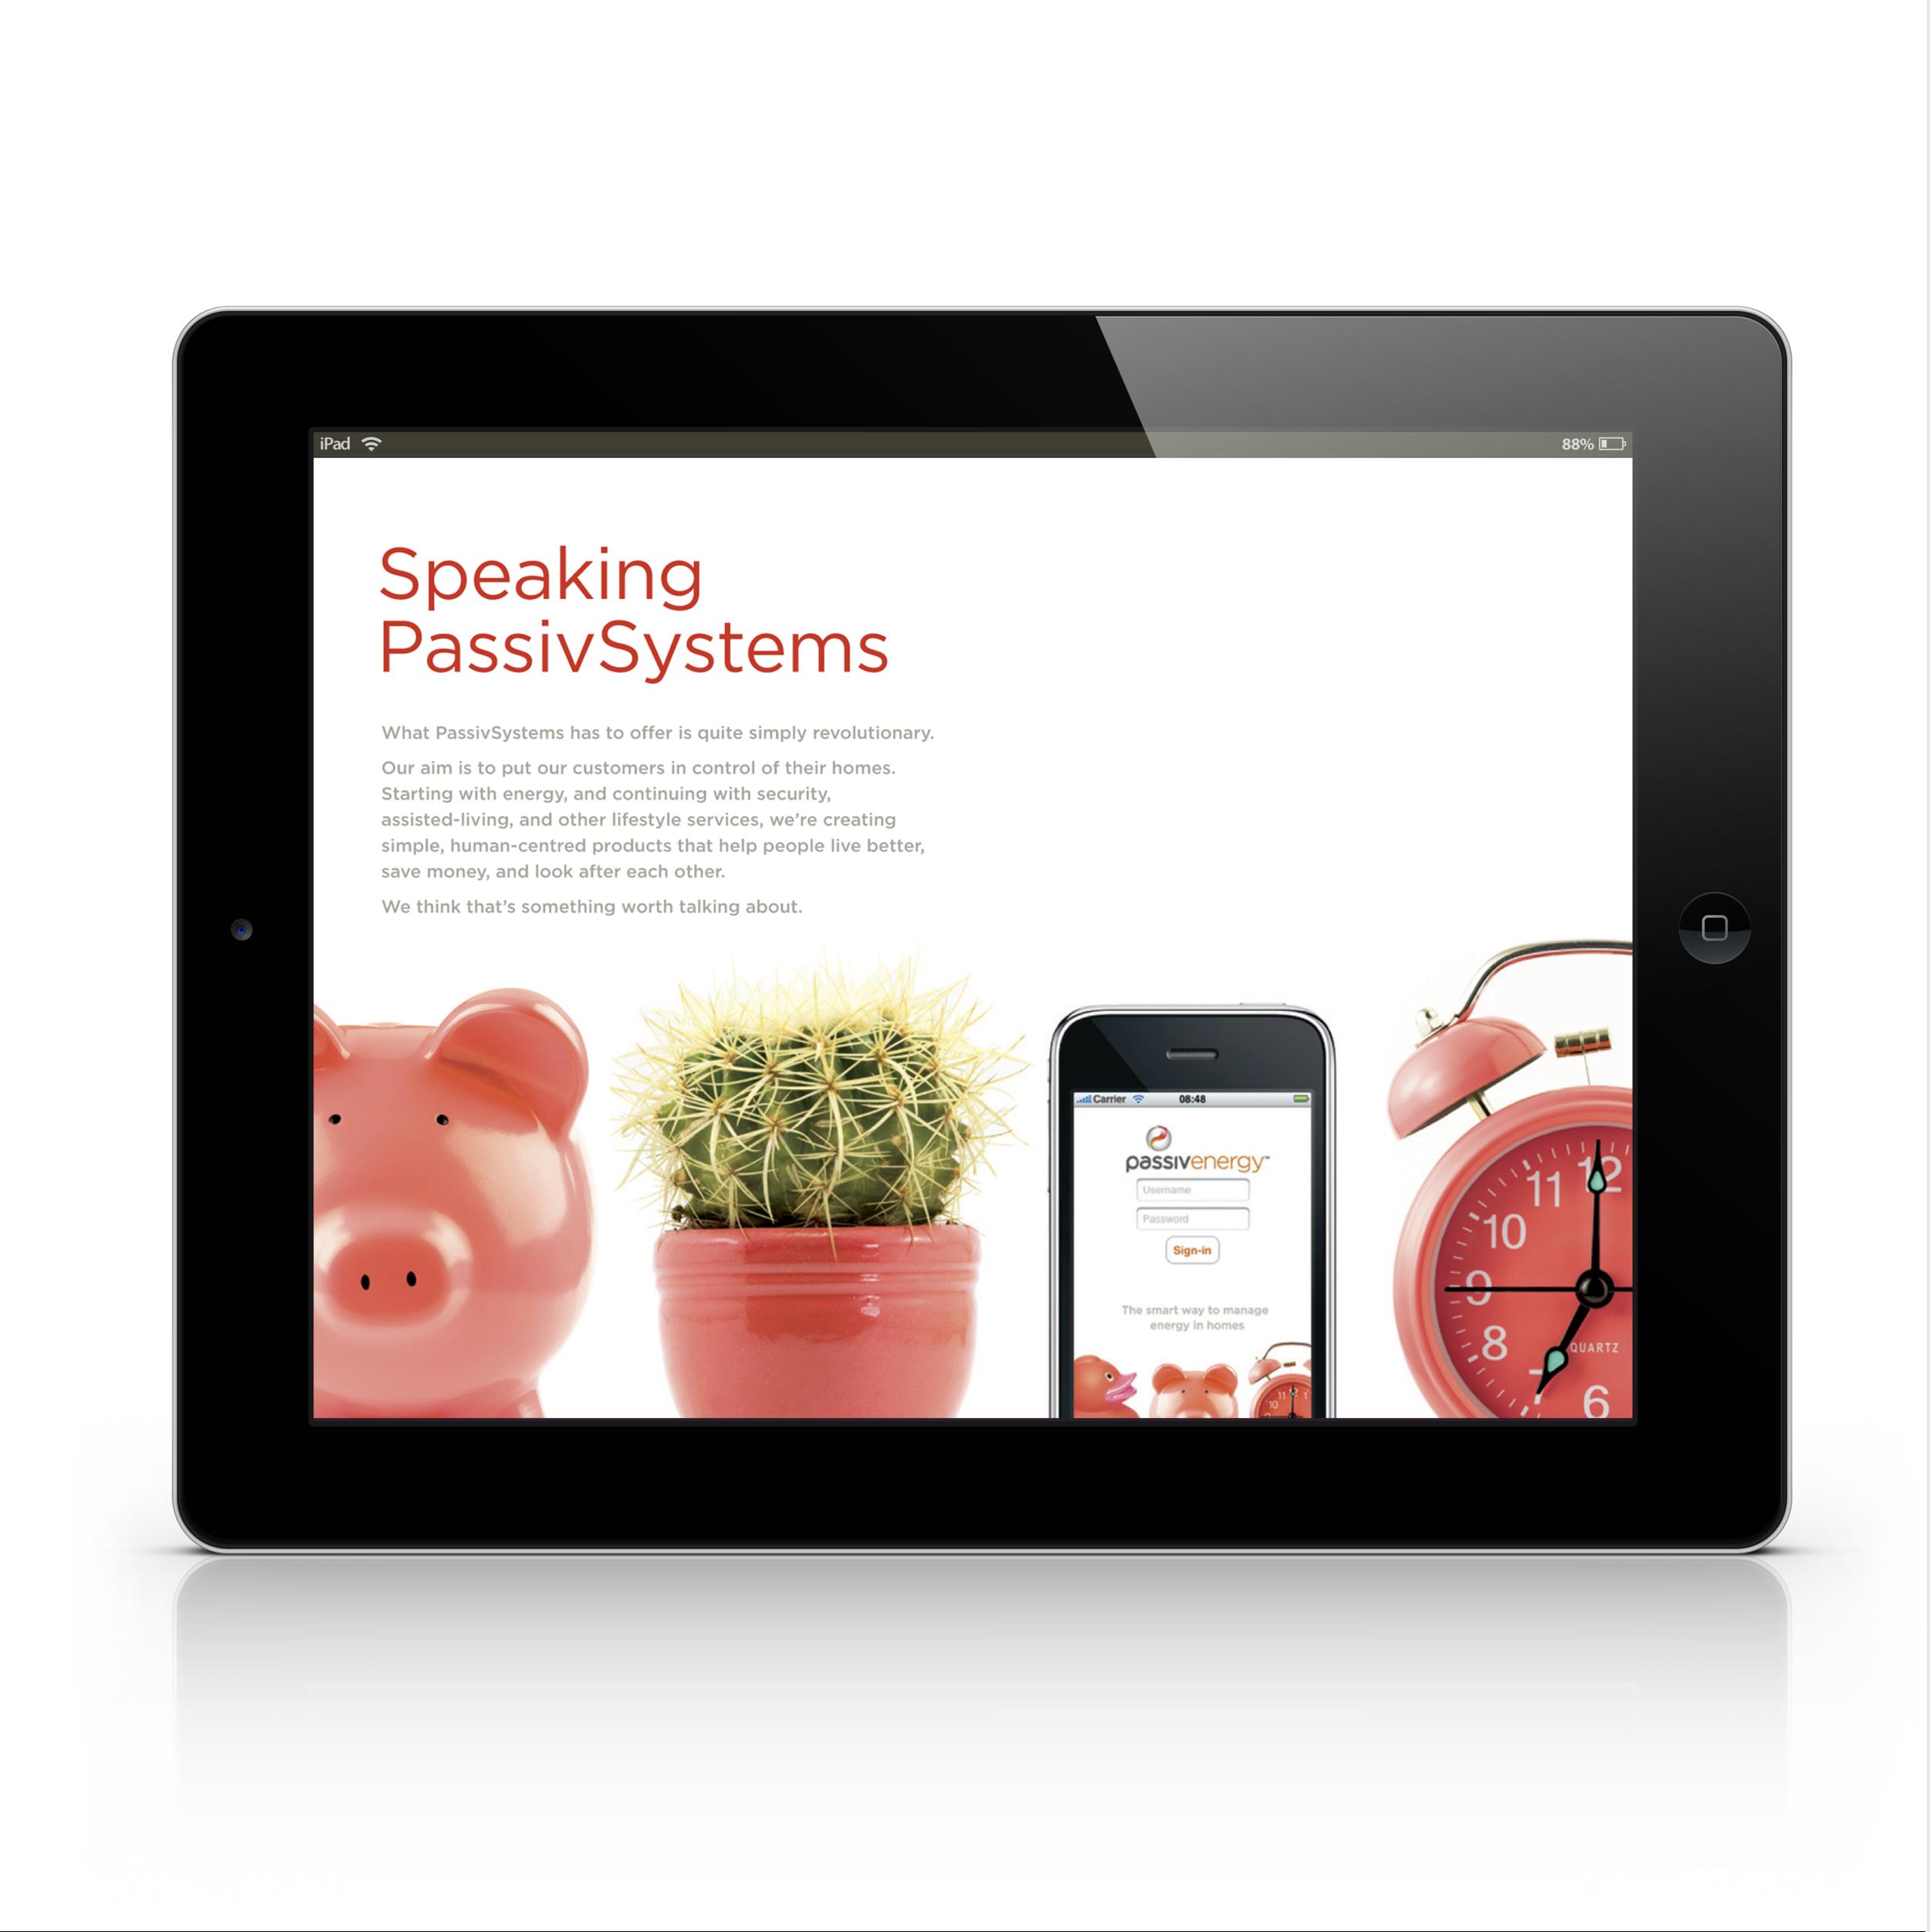 iPad-Landscape-Retina-Display-Mockup.png